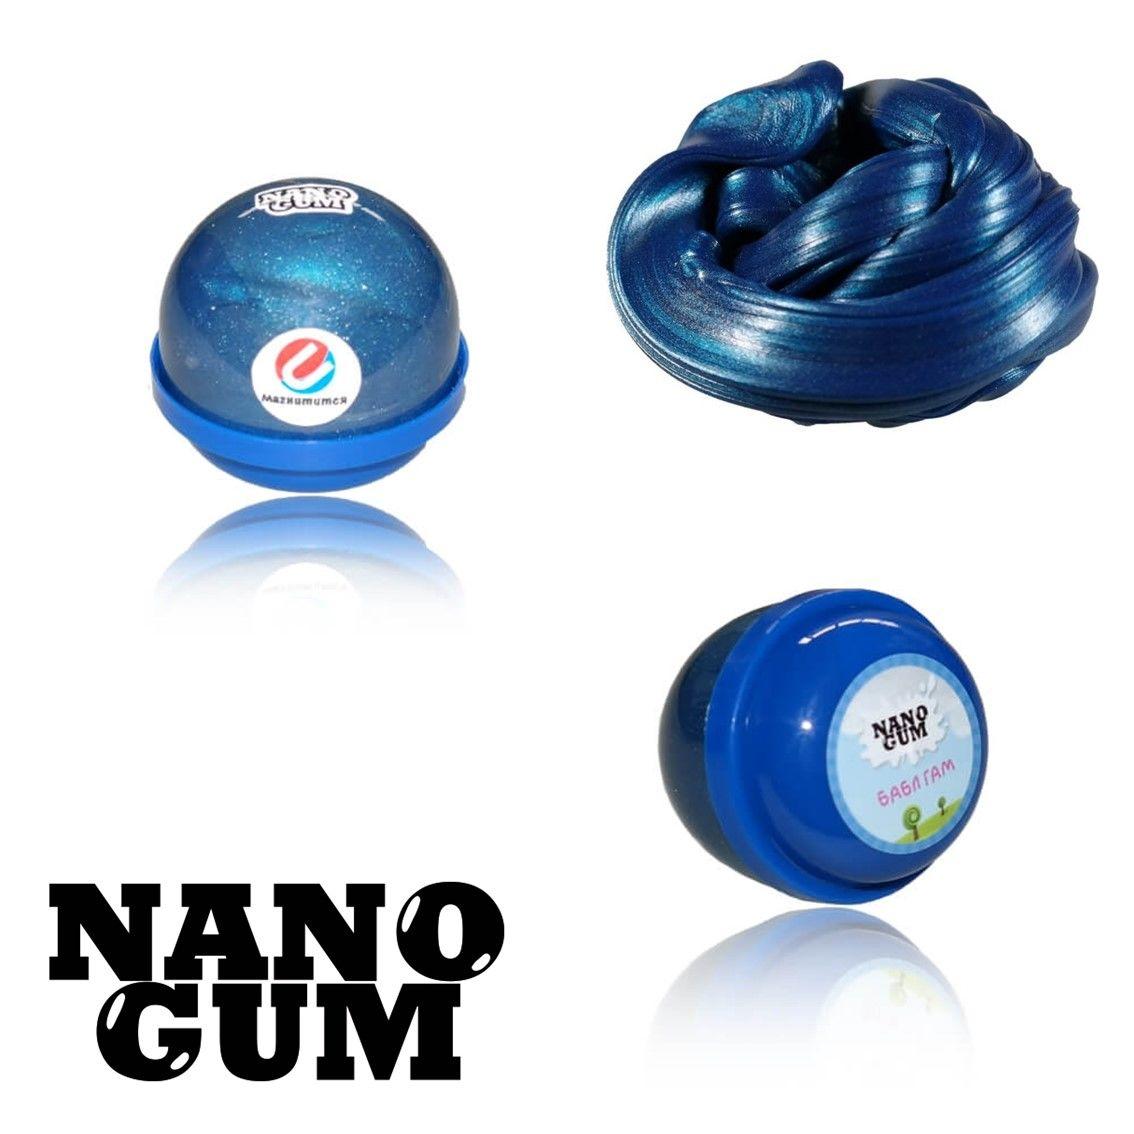 Жвачка для рук Nano gum Бабл гам 25гр.